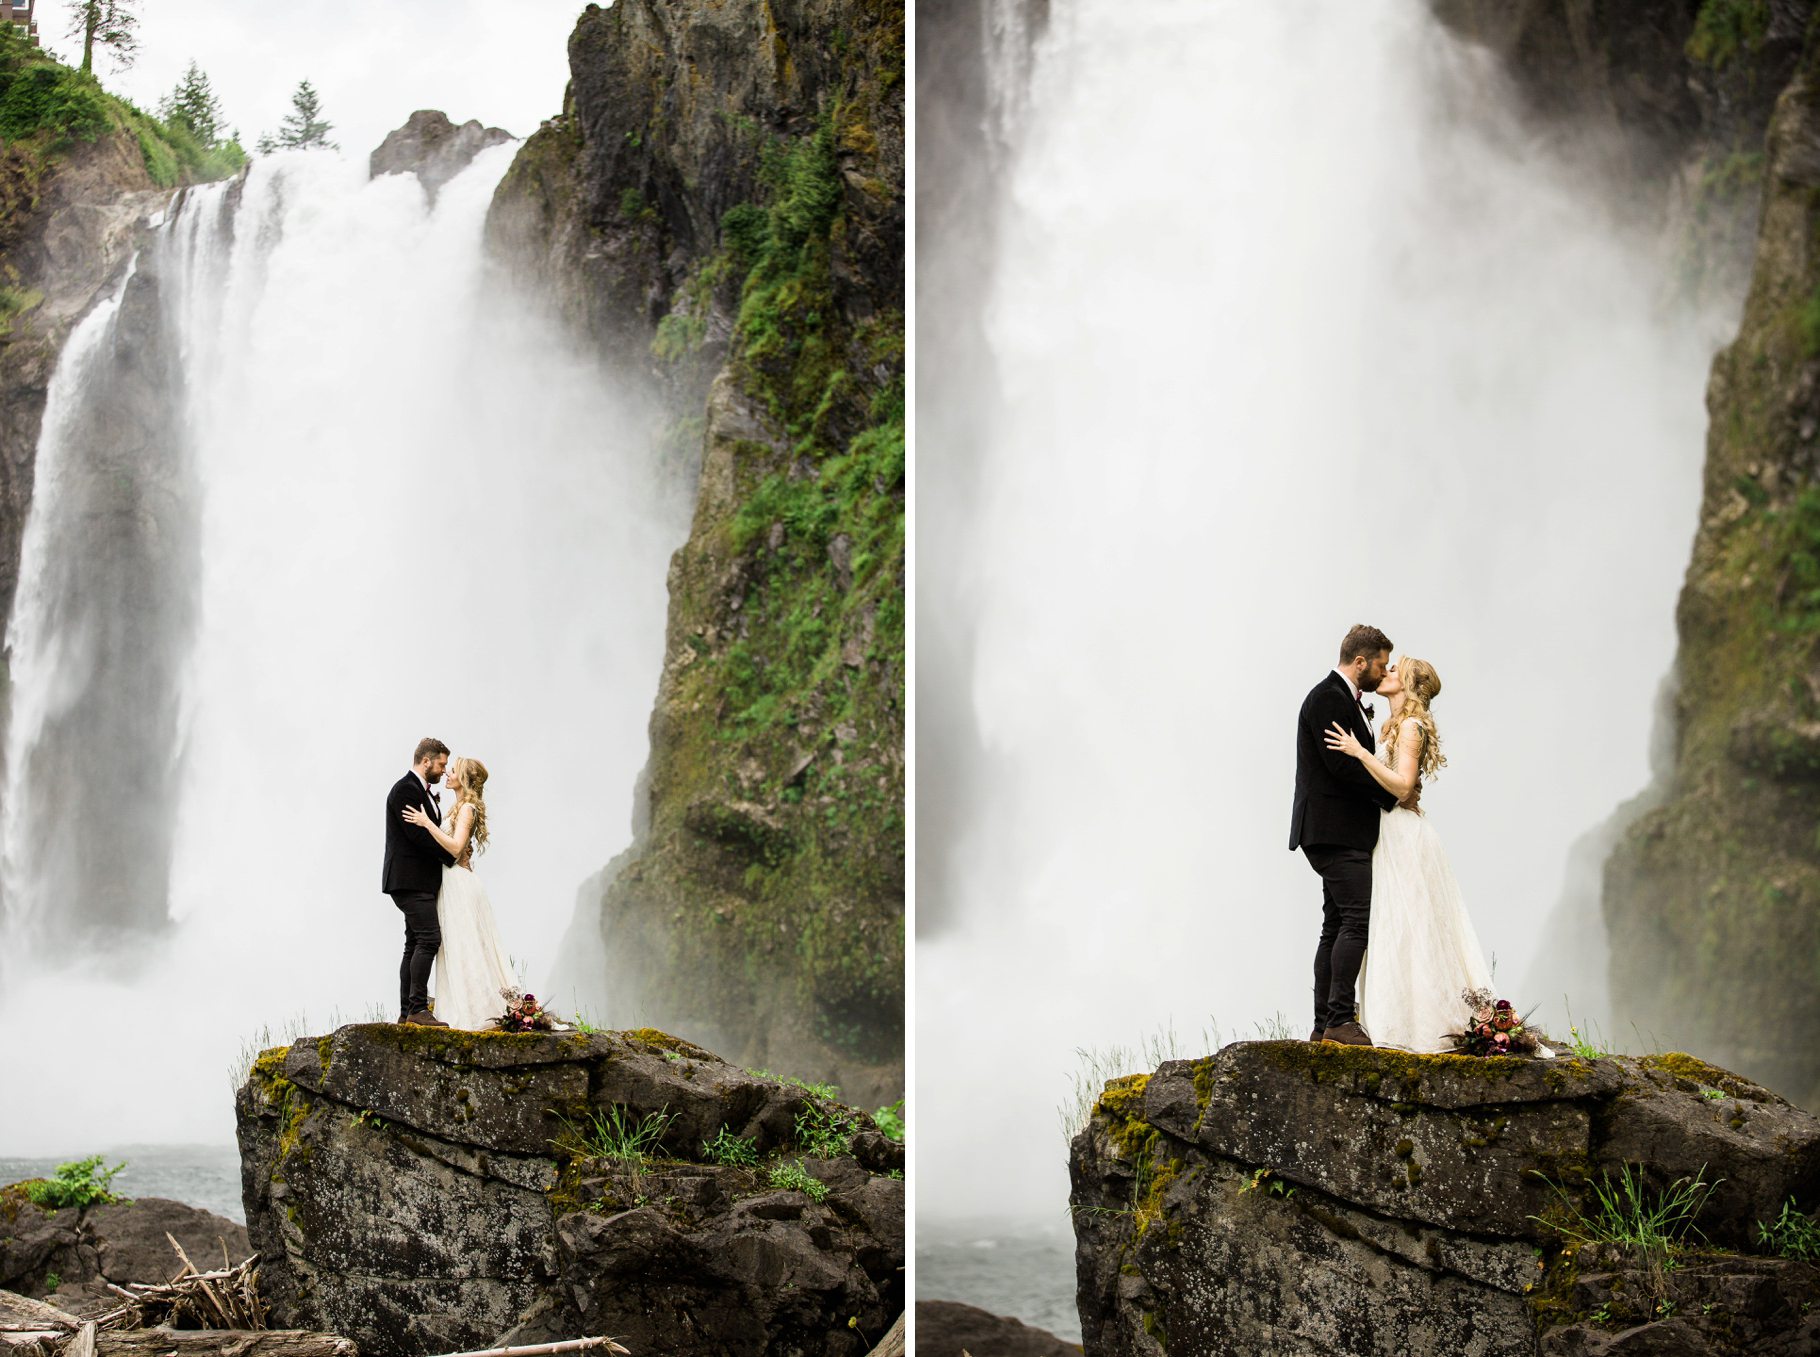 24-Adventure-Elopement-Waterfall-Seattle-Wedding-Photographer-Snoqualmie-Falls-Hike